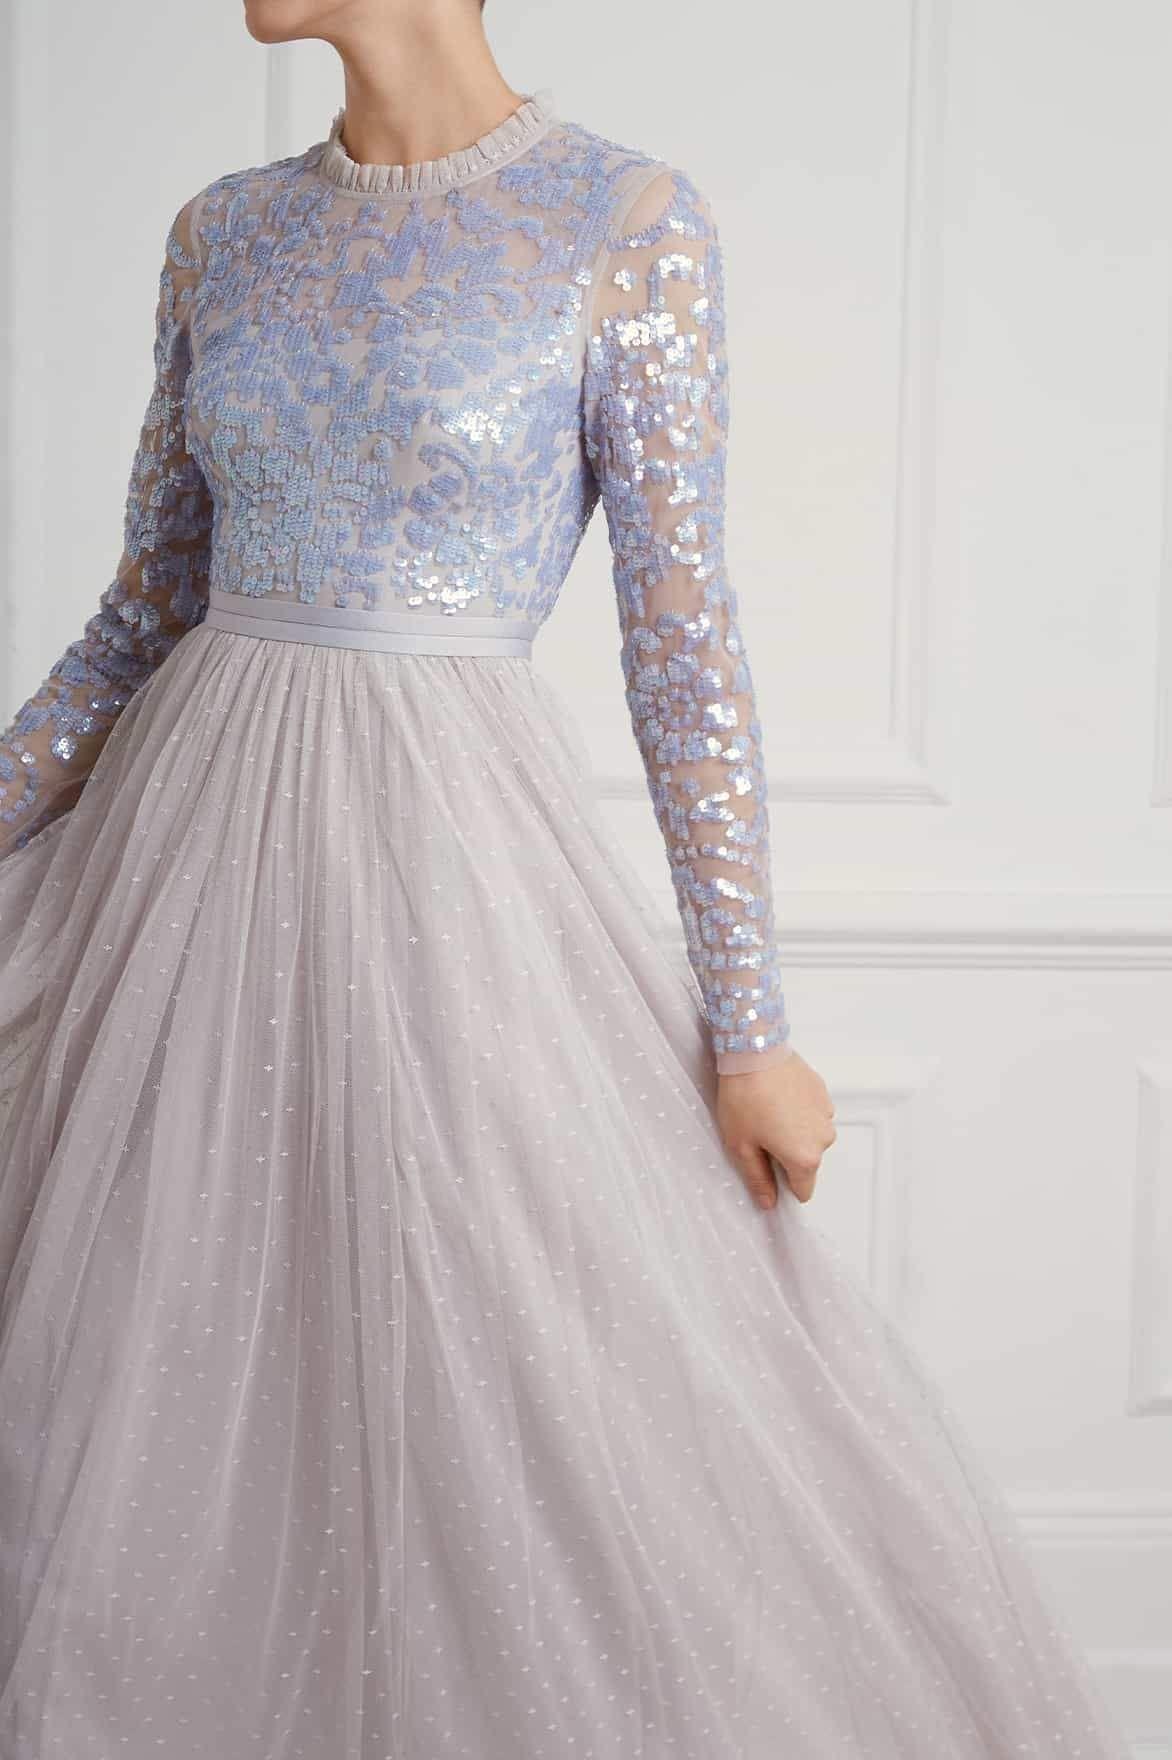 Ellie Wilde Ew120014 Periwinkle A Line Prom Dress Ellie Wilde Prom Dresses Prom Dresses Jovani A Line Gown [ 1400 x 1000 Pixel ]